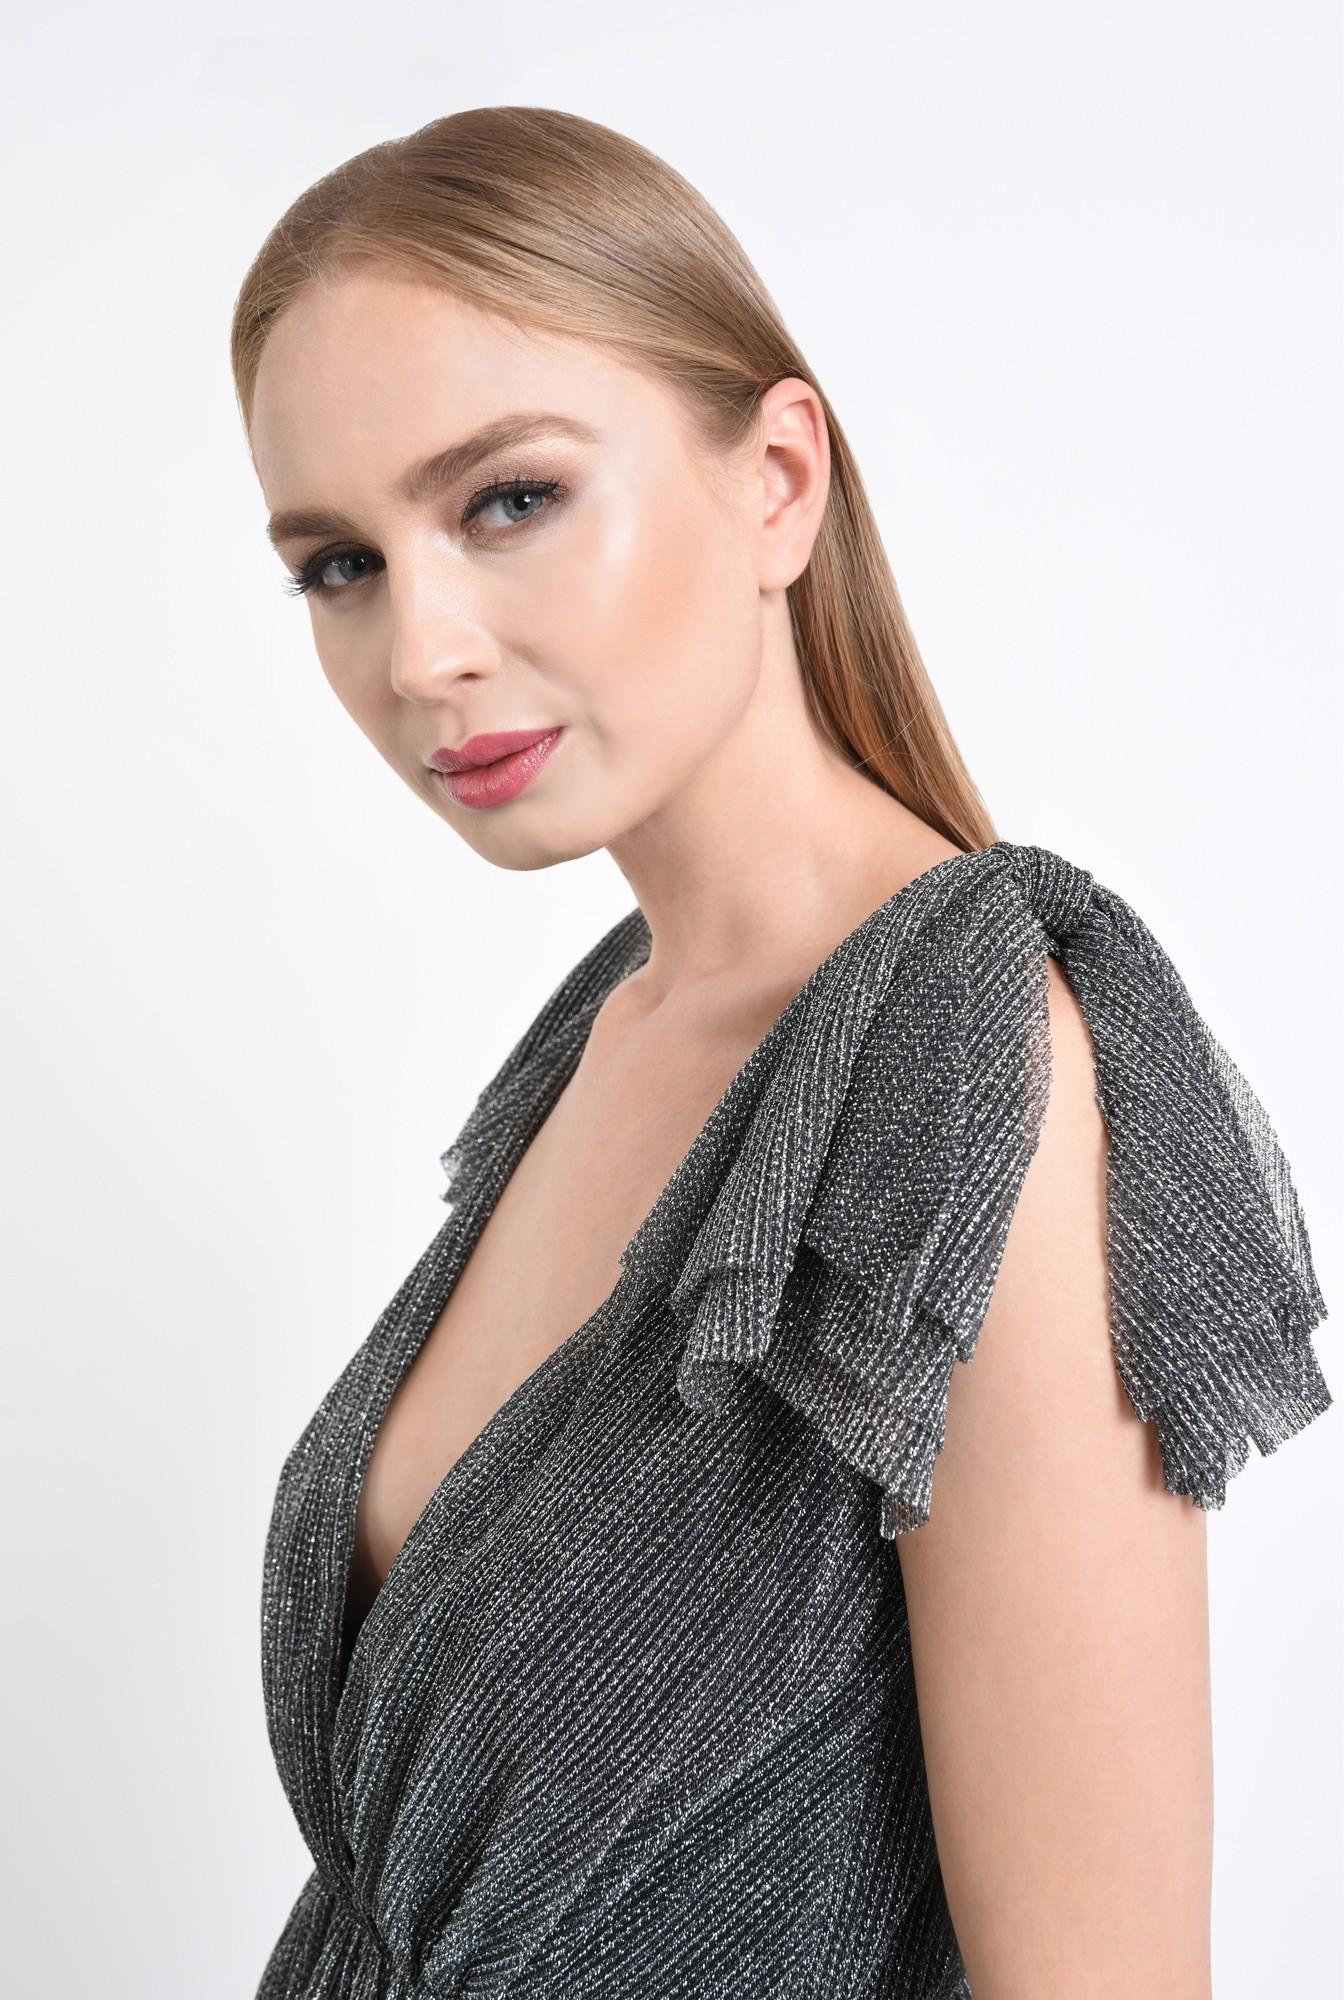 2 - rochie de ocazie, argintiu, negru, lurex, funde